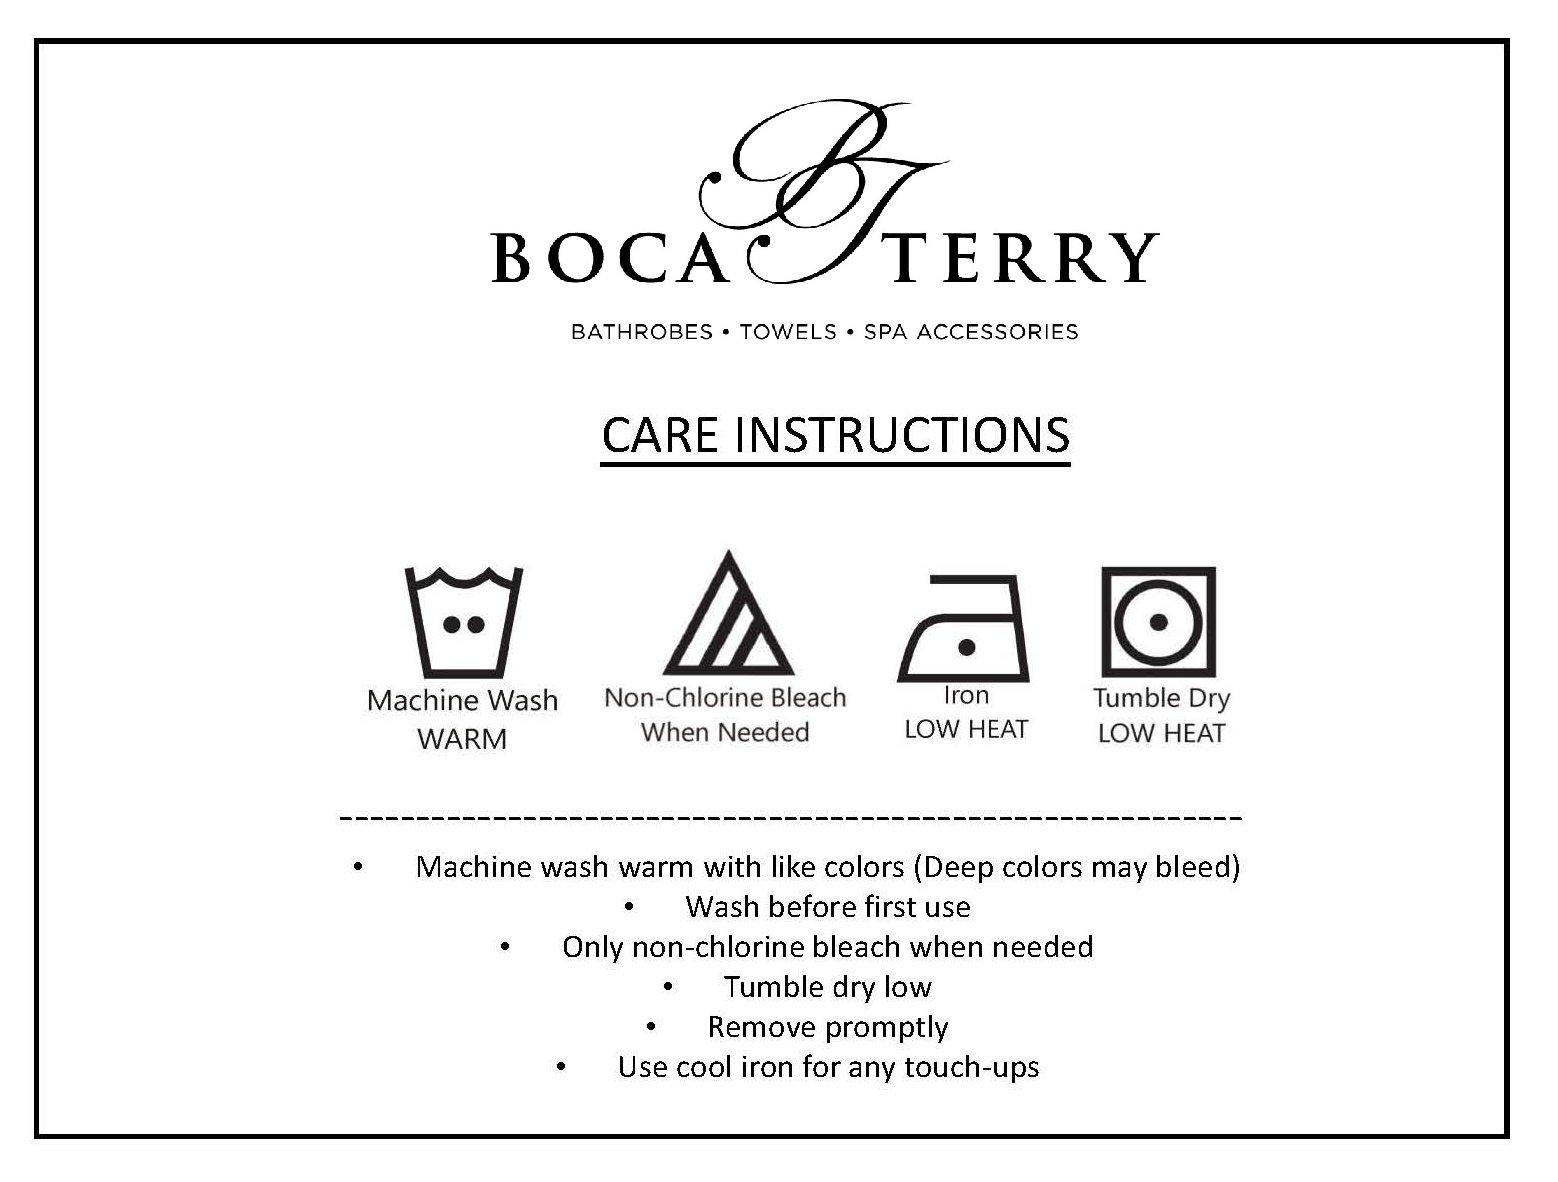 Boca Terry Women's Spa Wrap - Cotton Poly Waffle Spa, Shower and Bath Towel - XXL